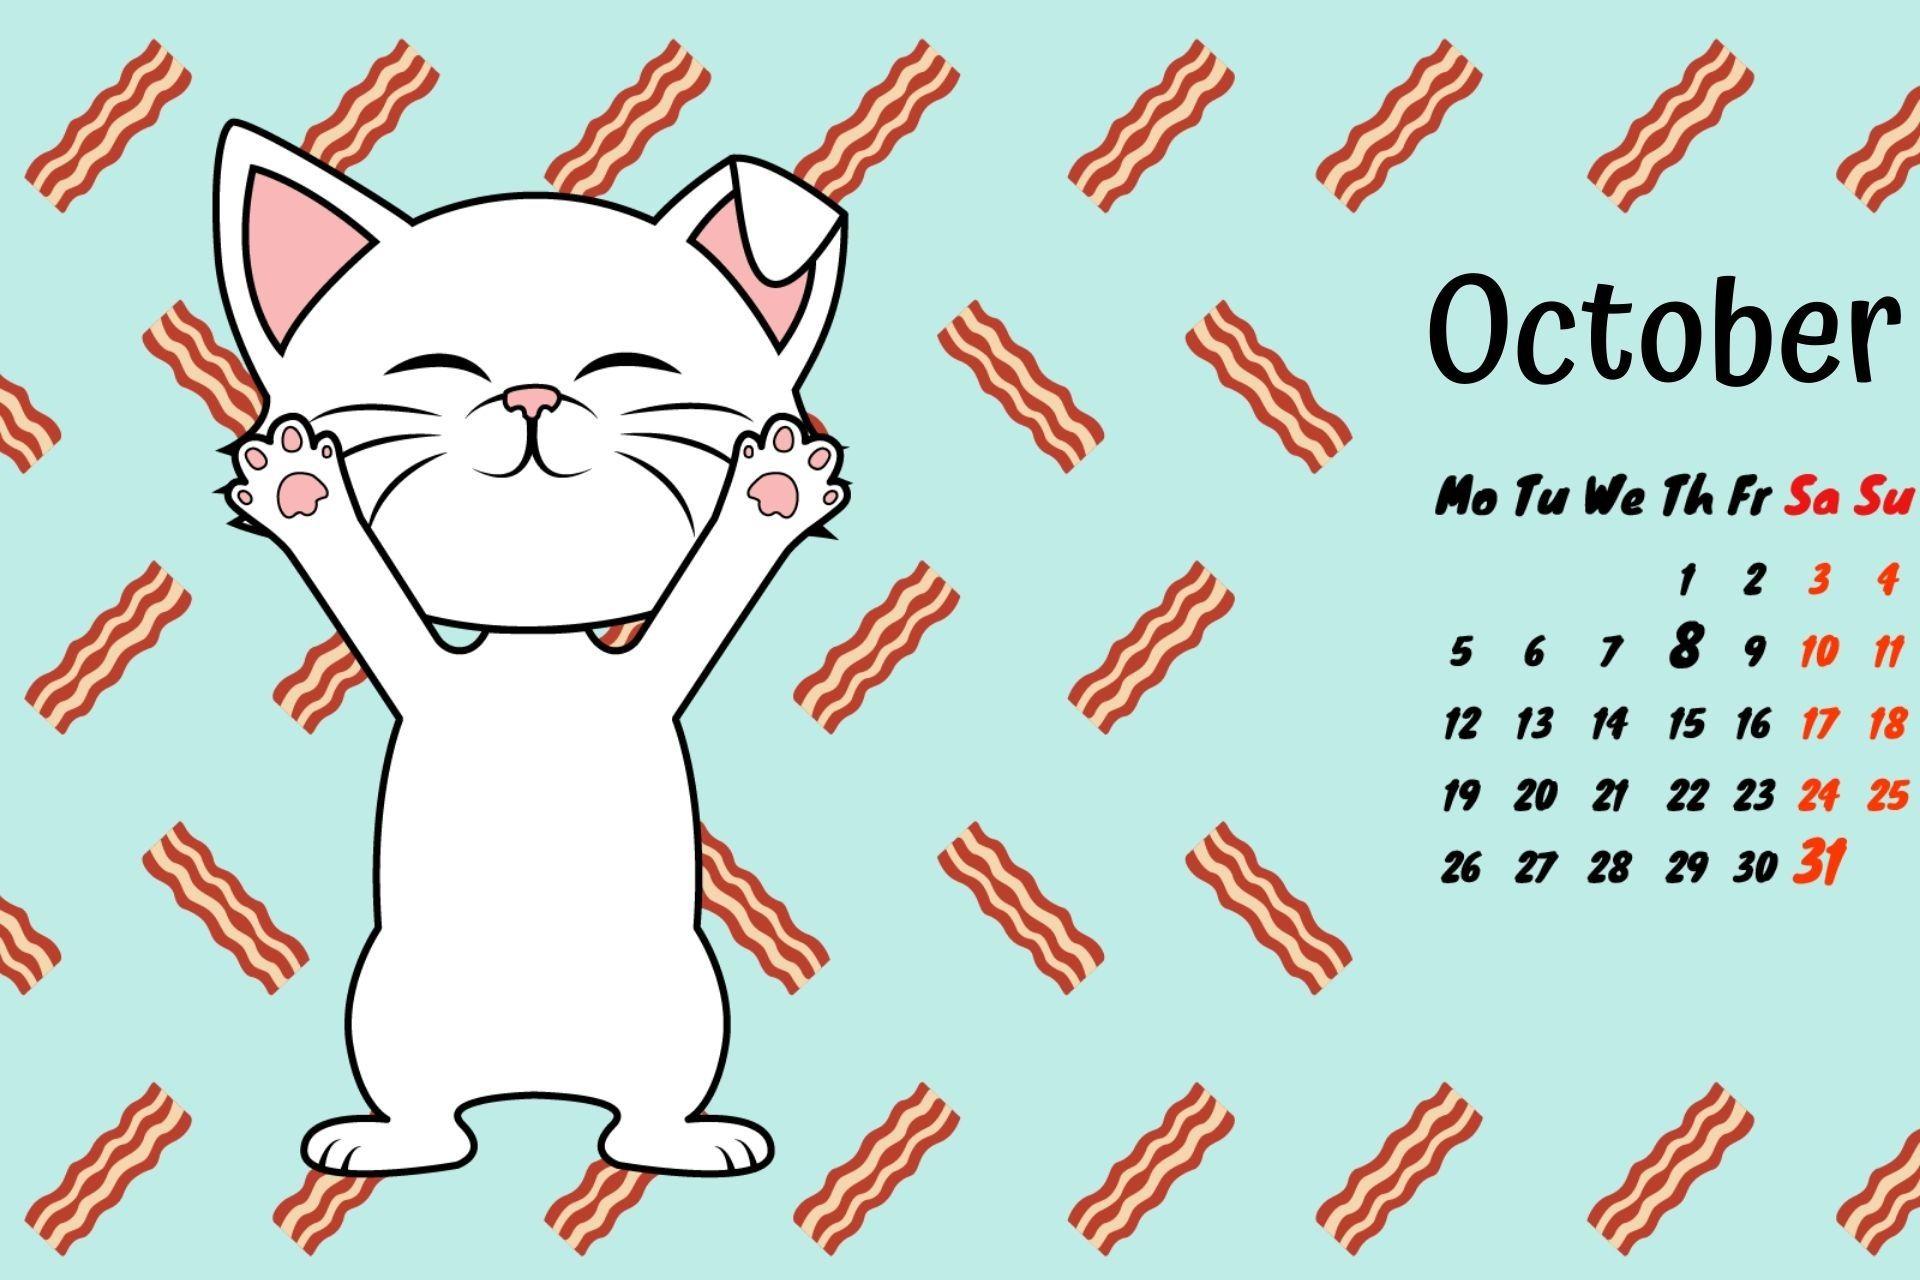 Free Printable 2018 Kitten Calendars Free Printables Printables Kitten